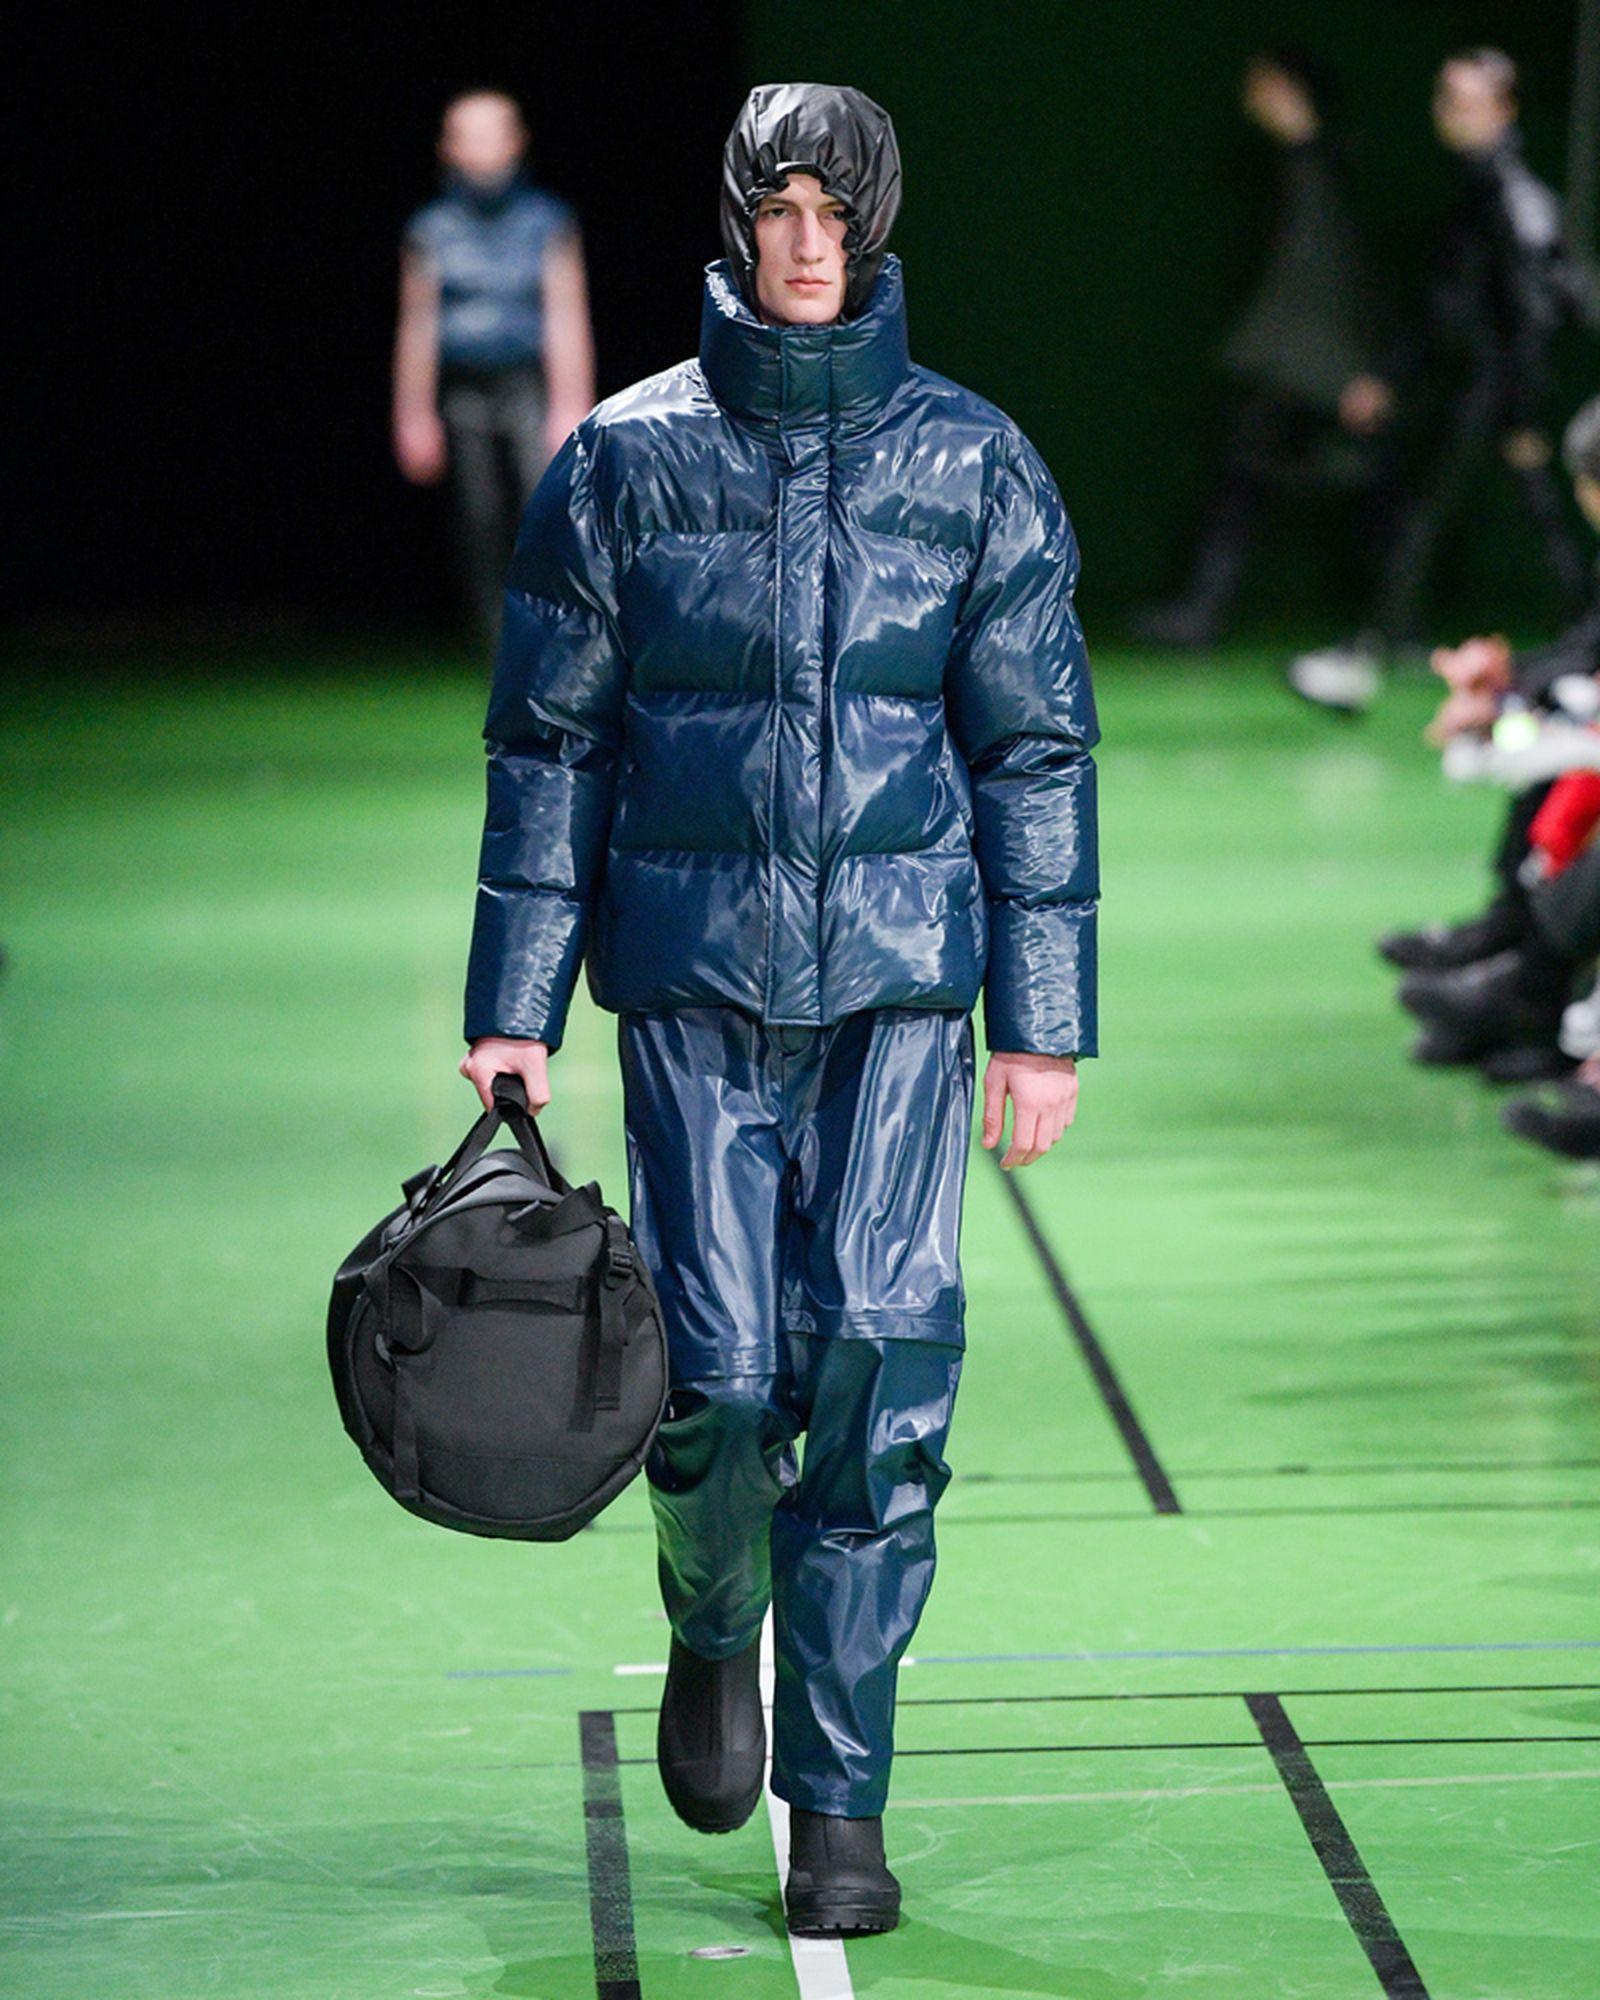 future-fashion-week-copenhagen-rains-9